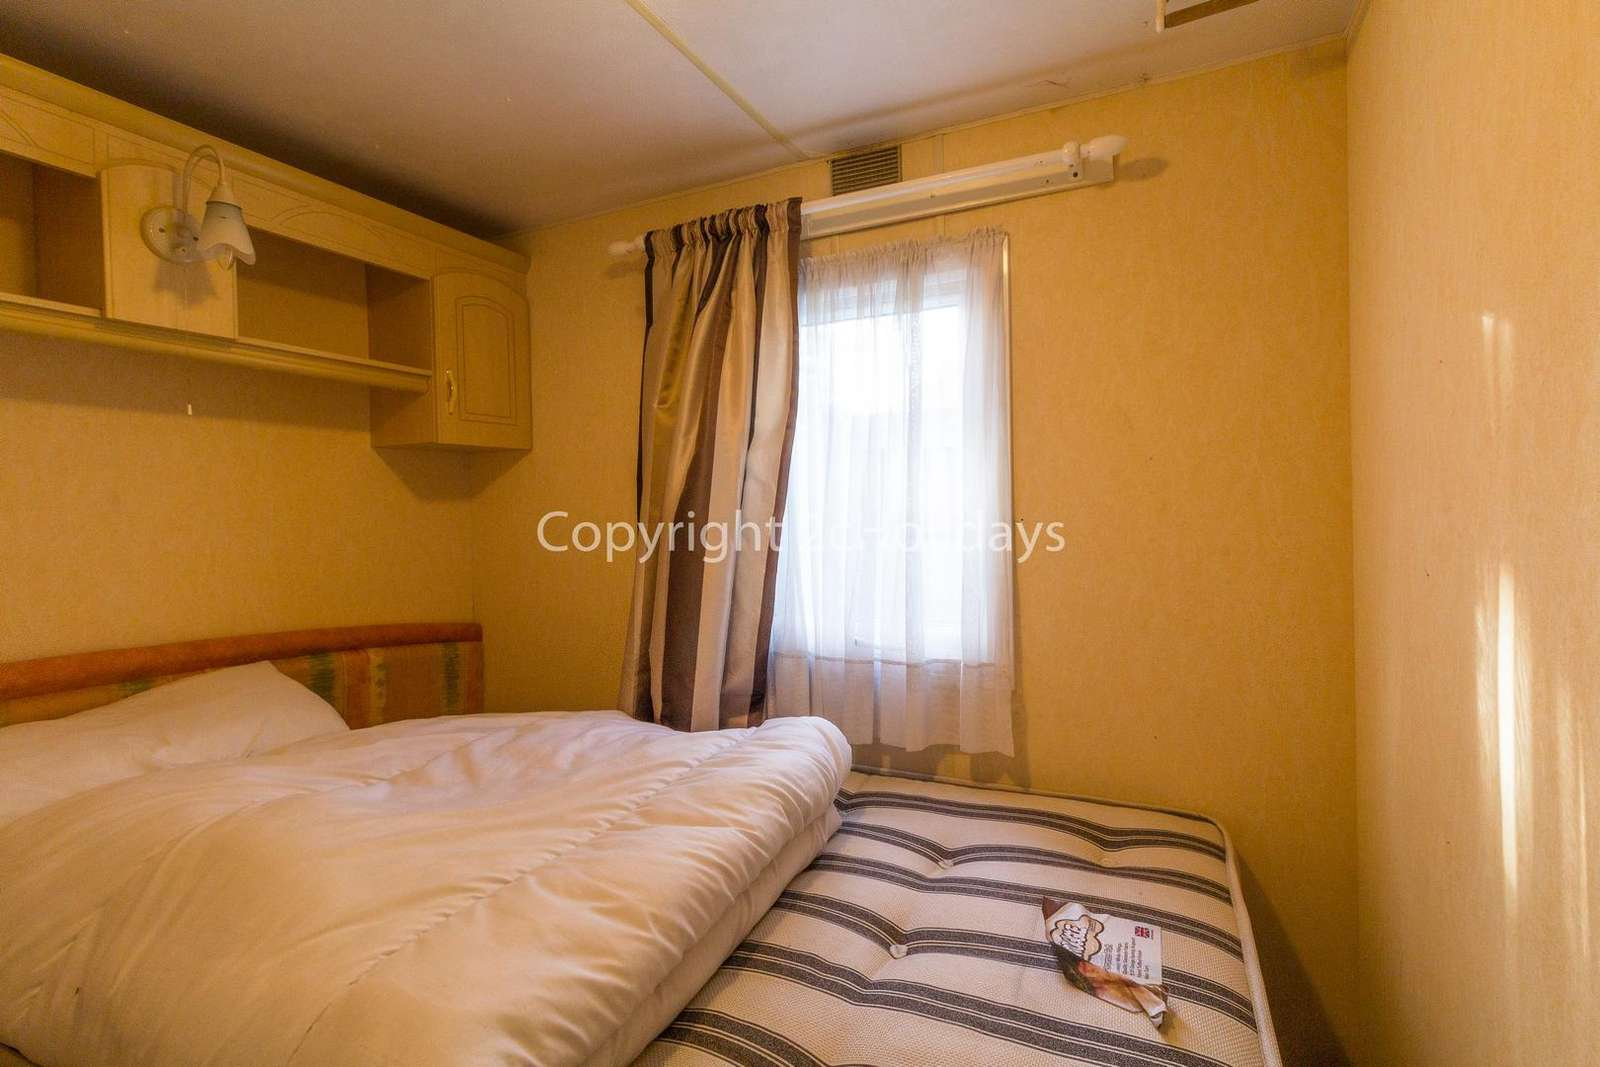 Coastal accommodation is Lowestoft